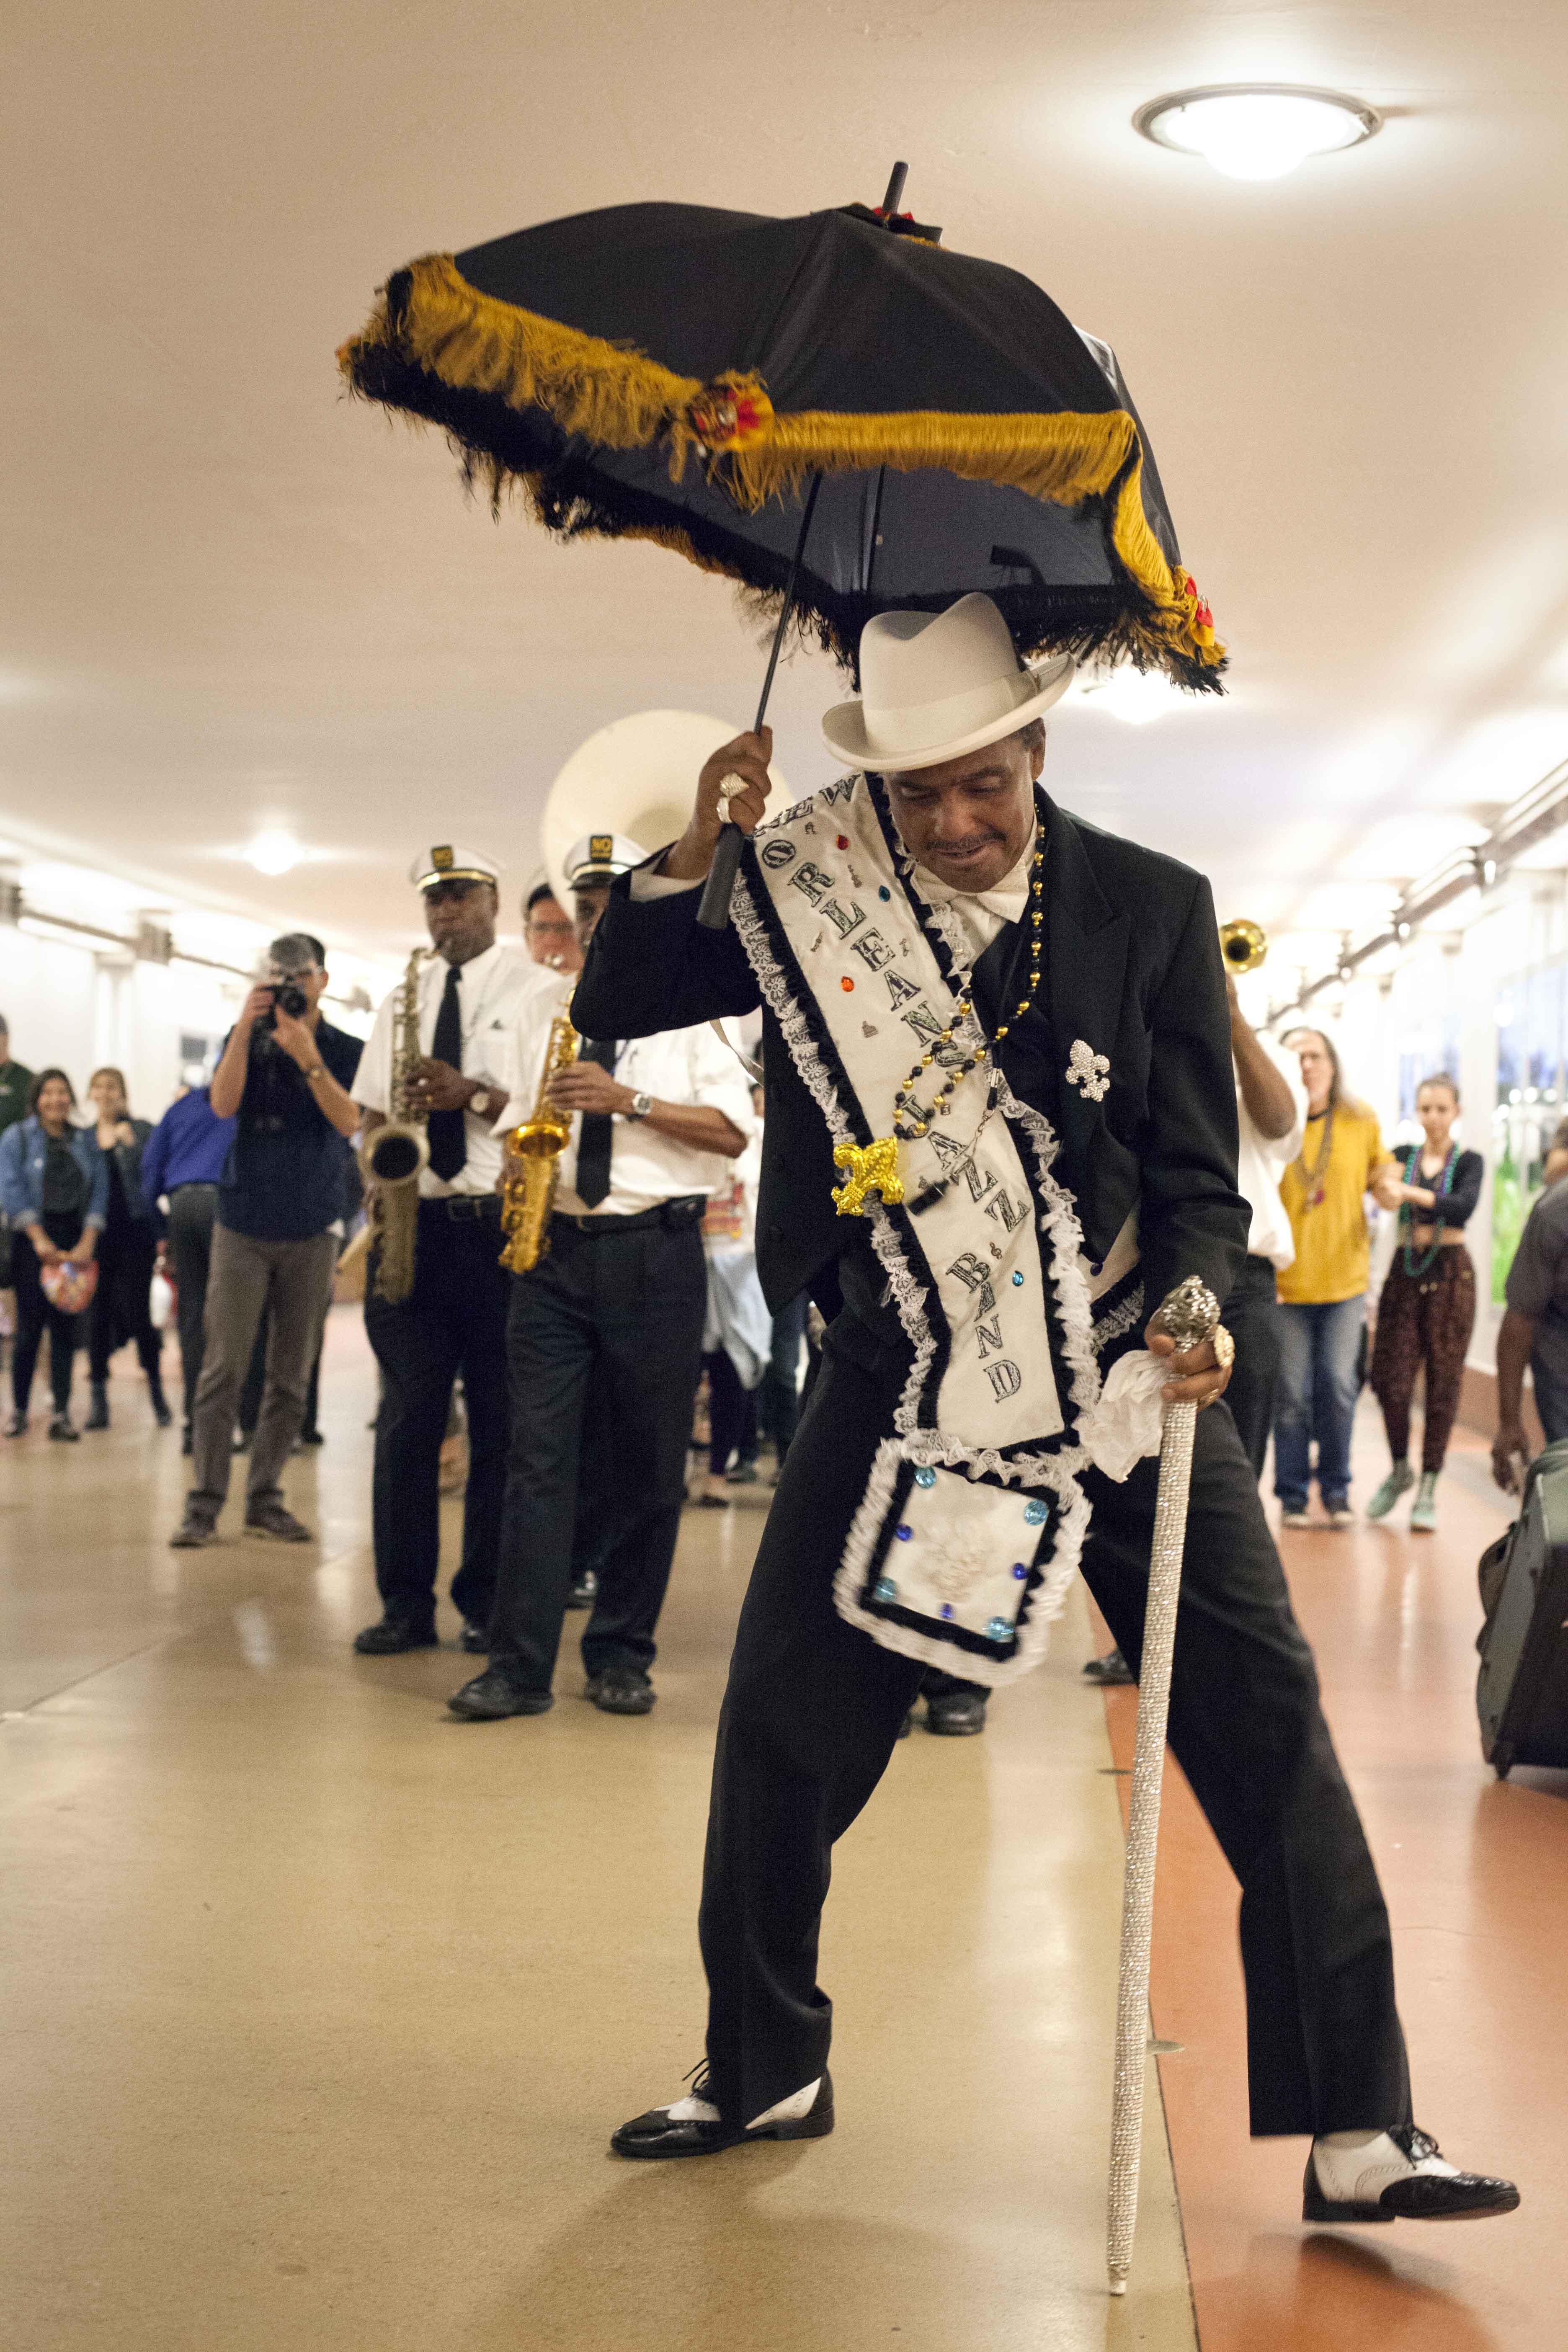 New Orleans-style jazz band splashes some Mardi Gras energy at Union